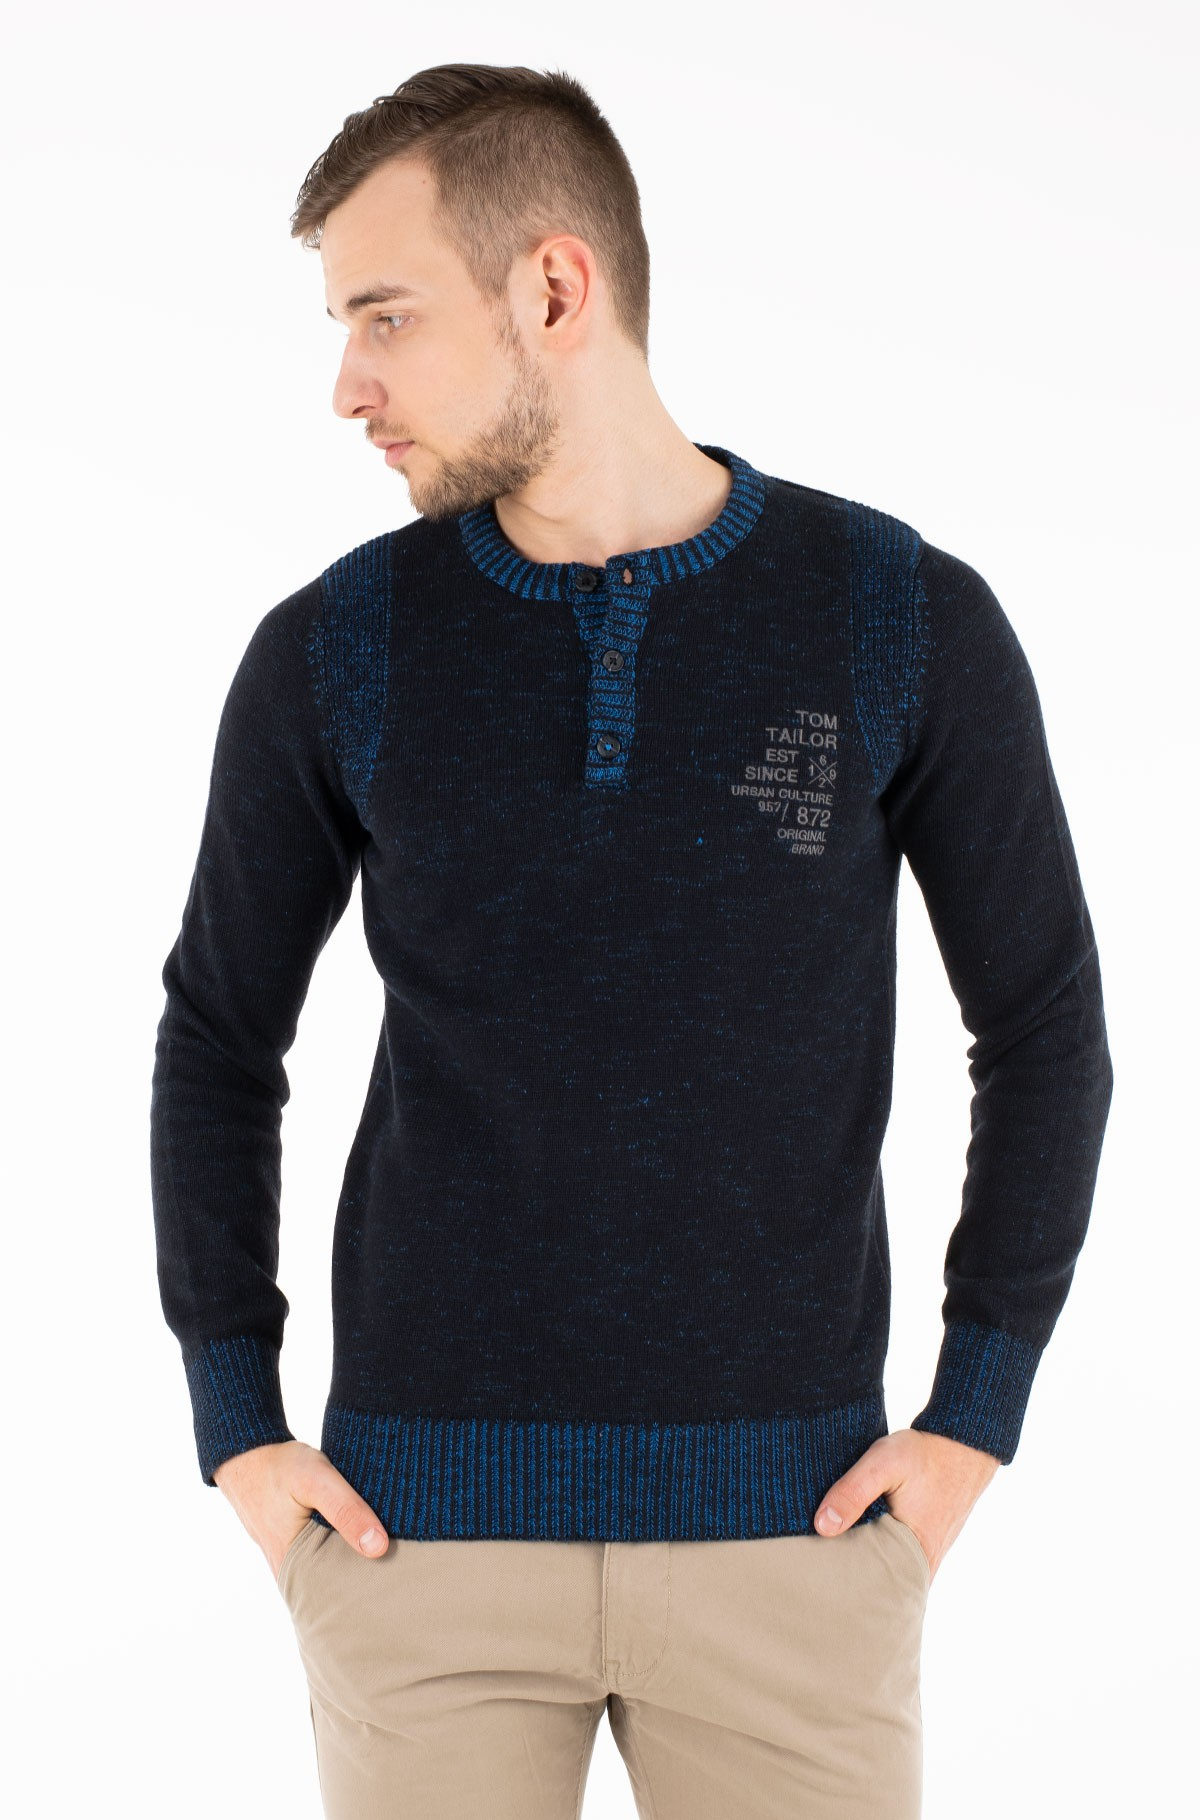 Sweater 1006483-full-1